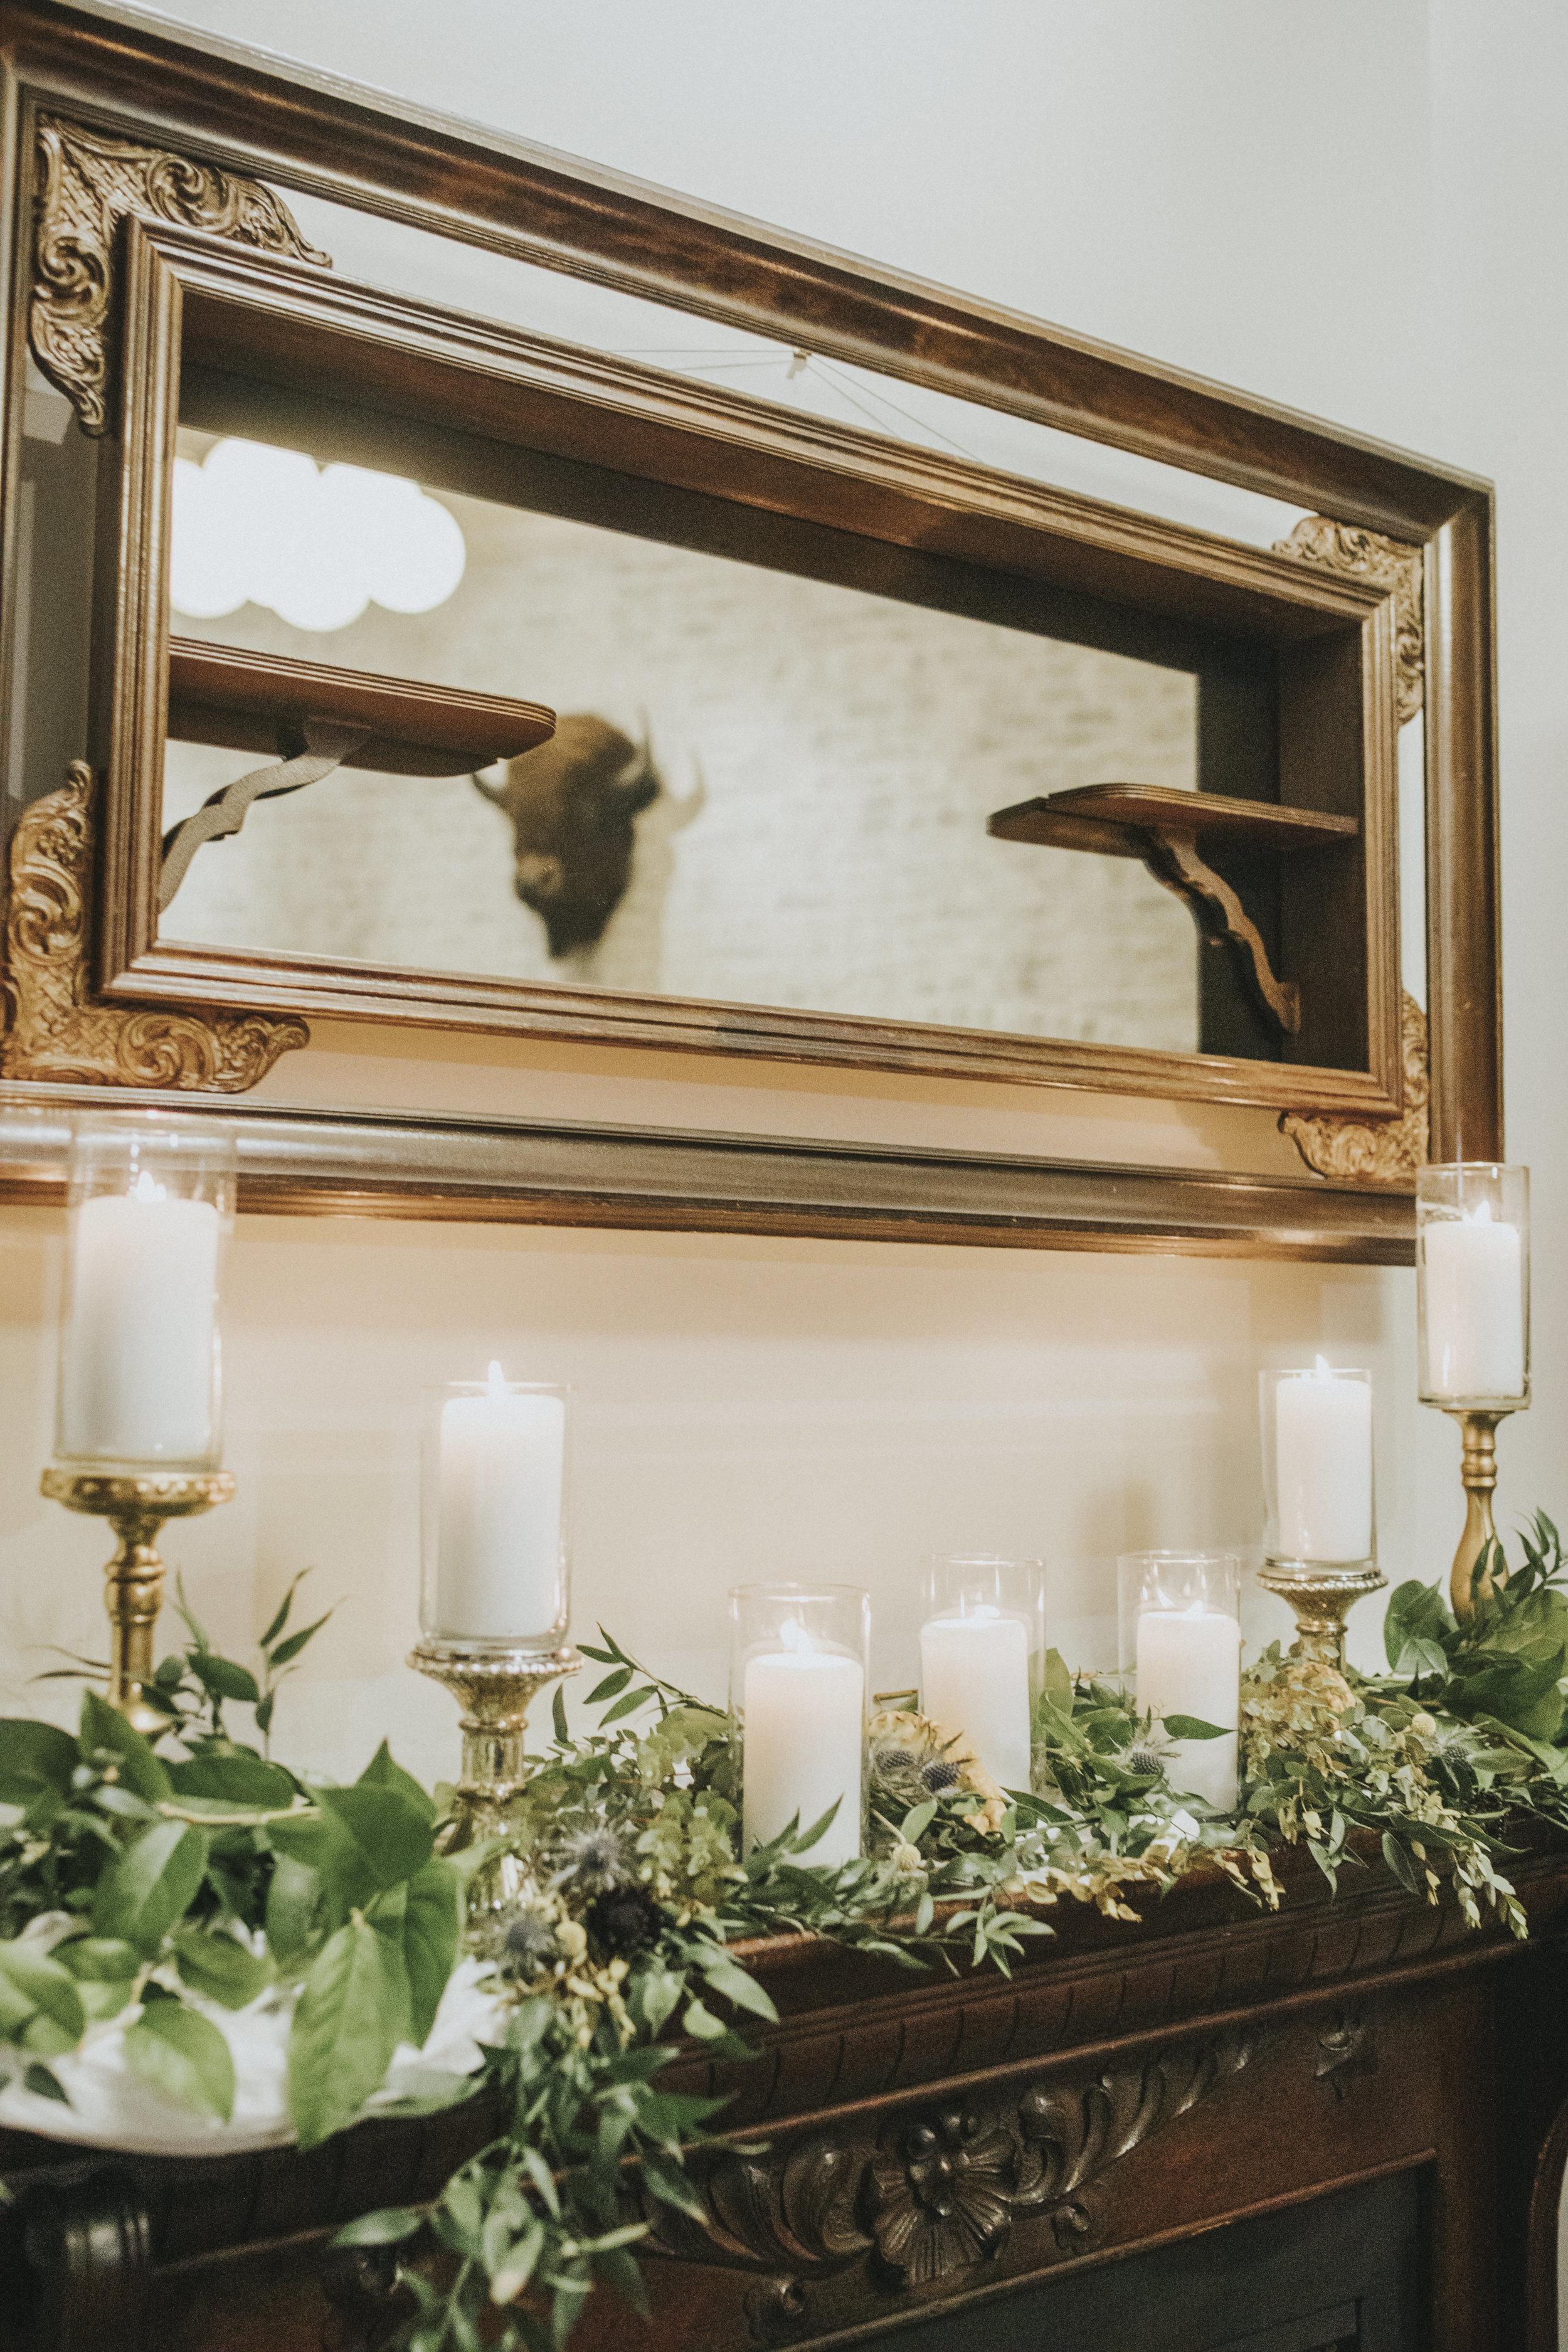 196 tiny-luxe-weddings-custom-elopement-summer-omaha-old-market.jpg